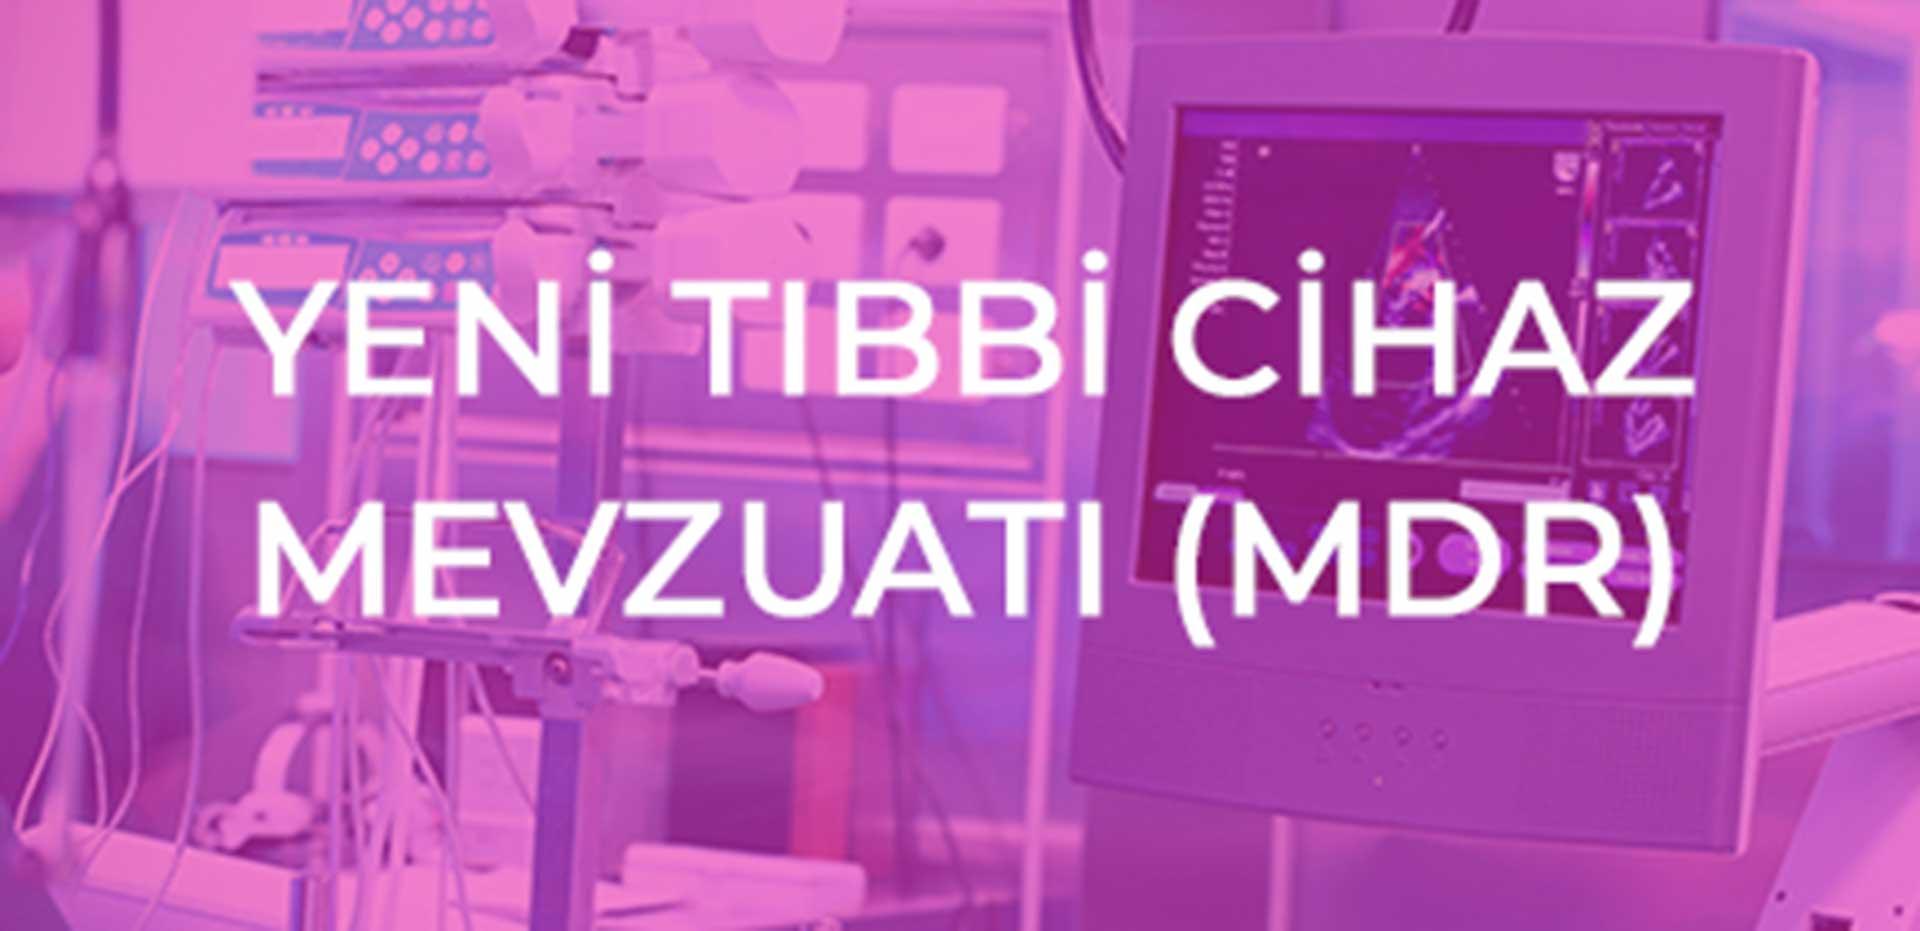 Yeni Tıbbi Cihaz Mevzuatı (MDR)